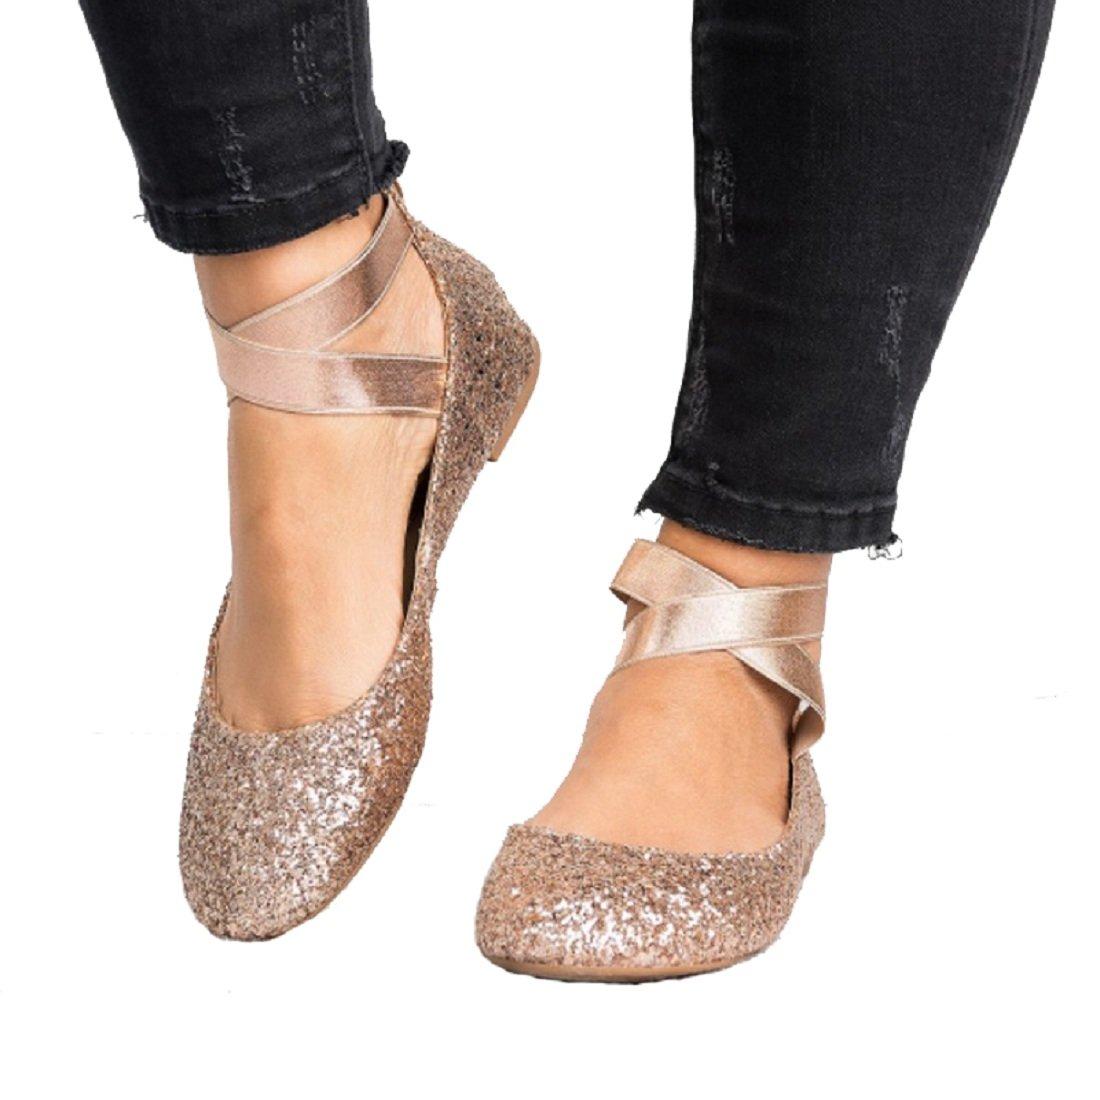 DOTACOKO Women Classic Elastic Ankle Flats Criss Cross Straps Slip on Round Toe Casual Ballet Shoes B07F6FFJBD 6.5 B(M) US|Gold